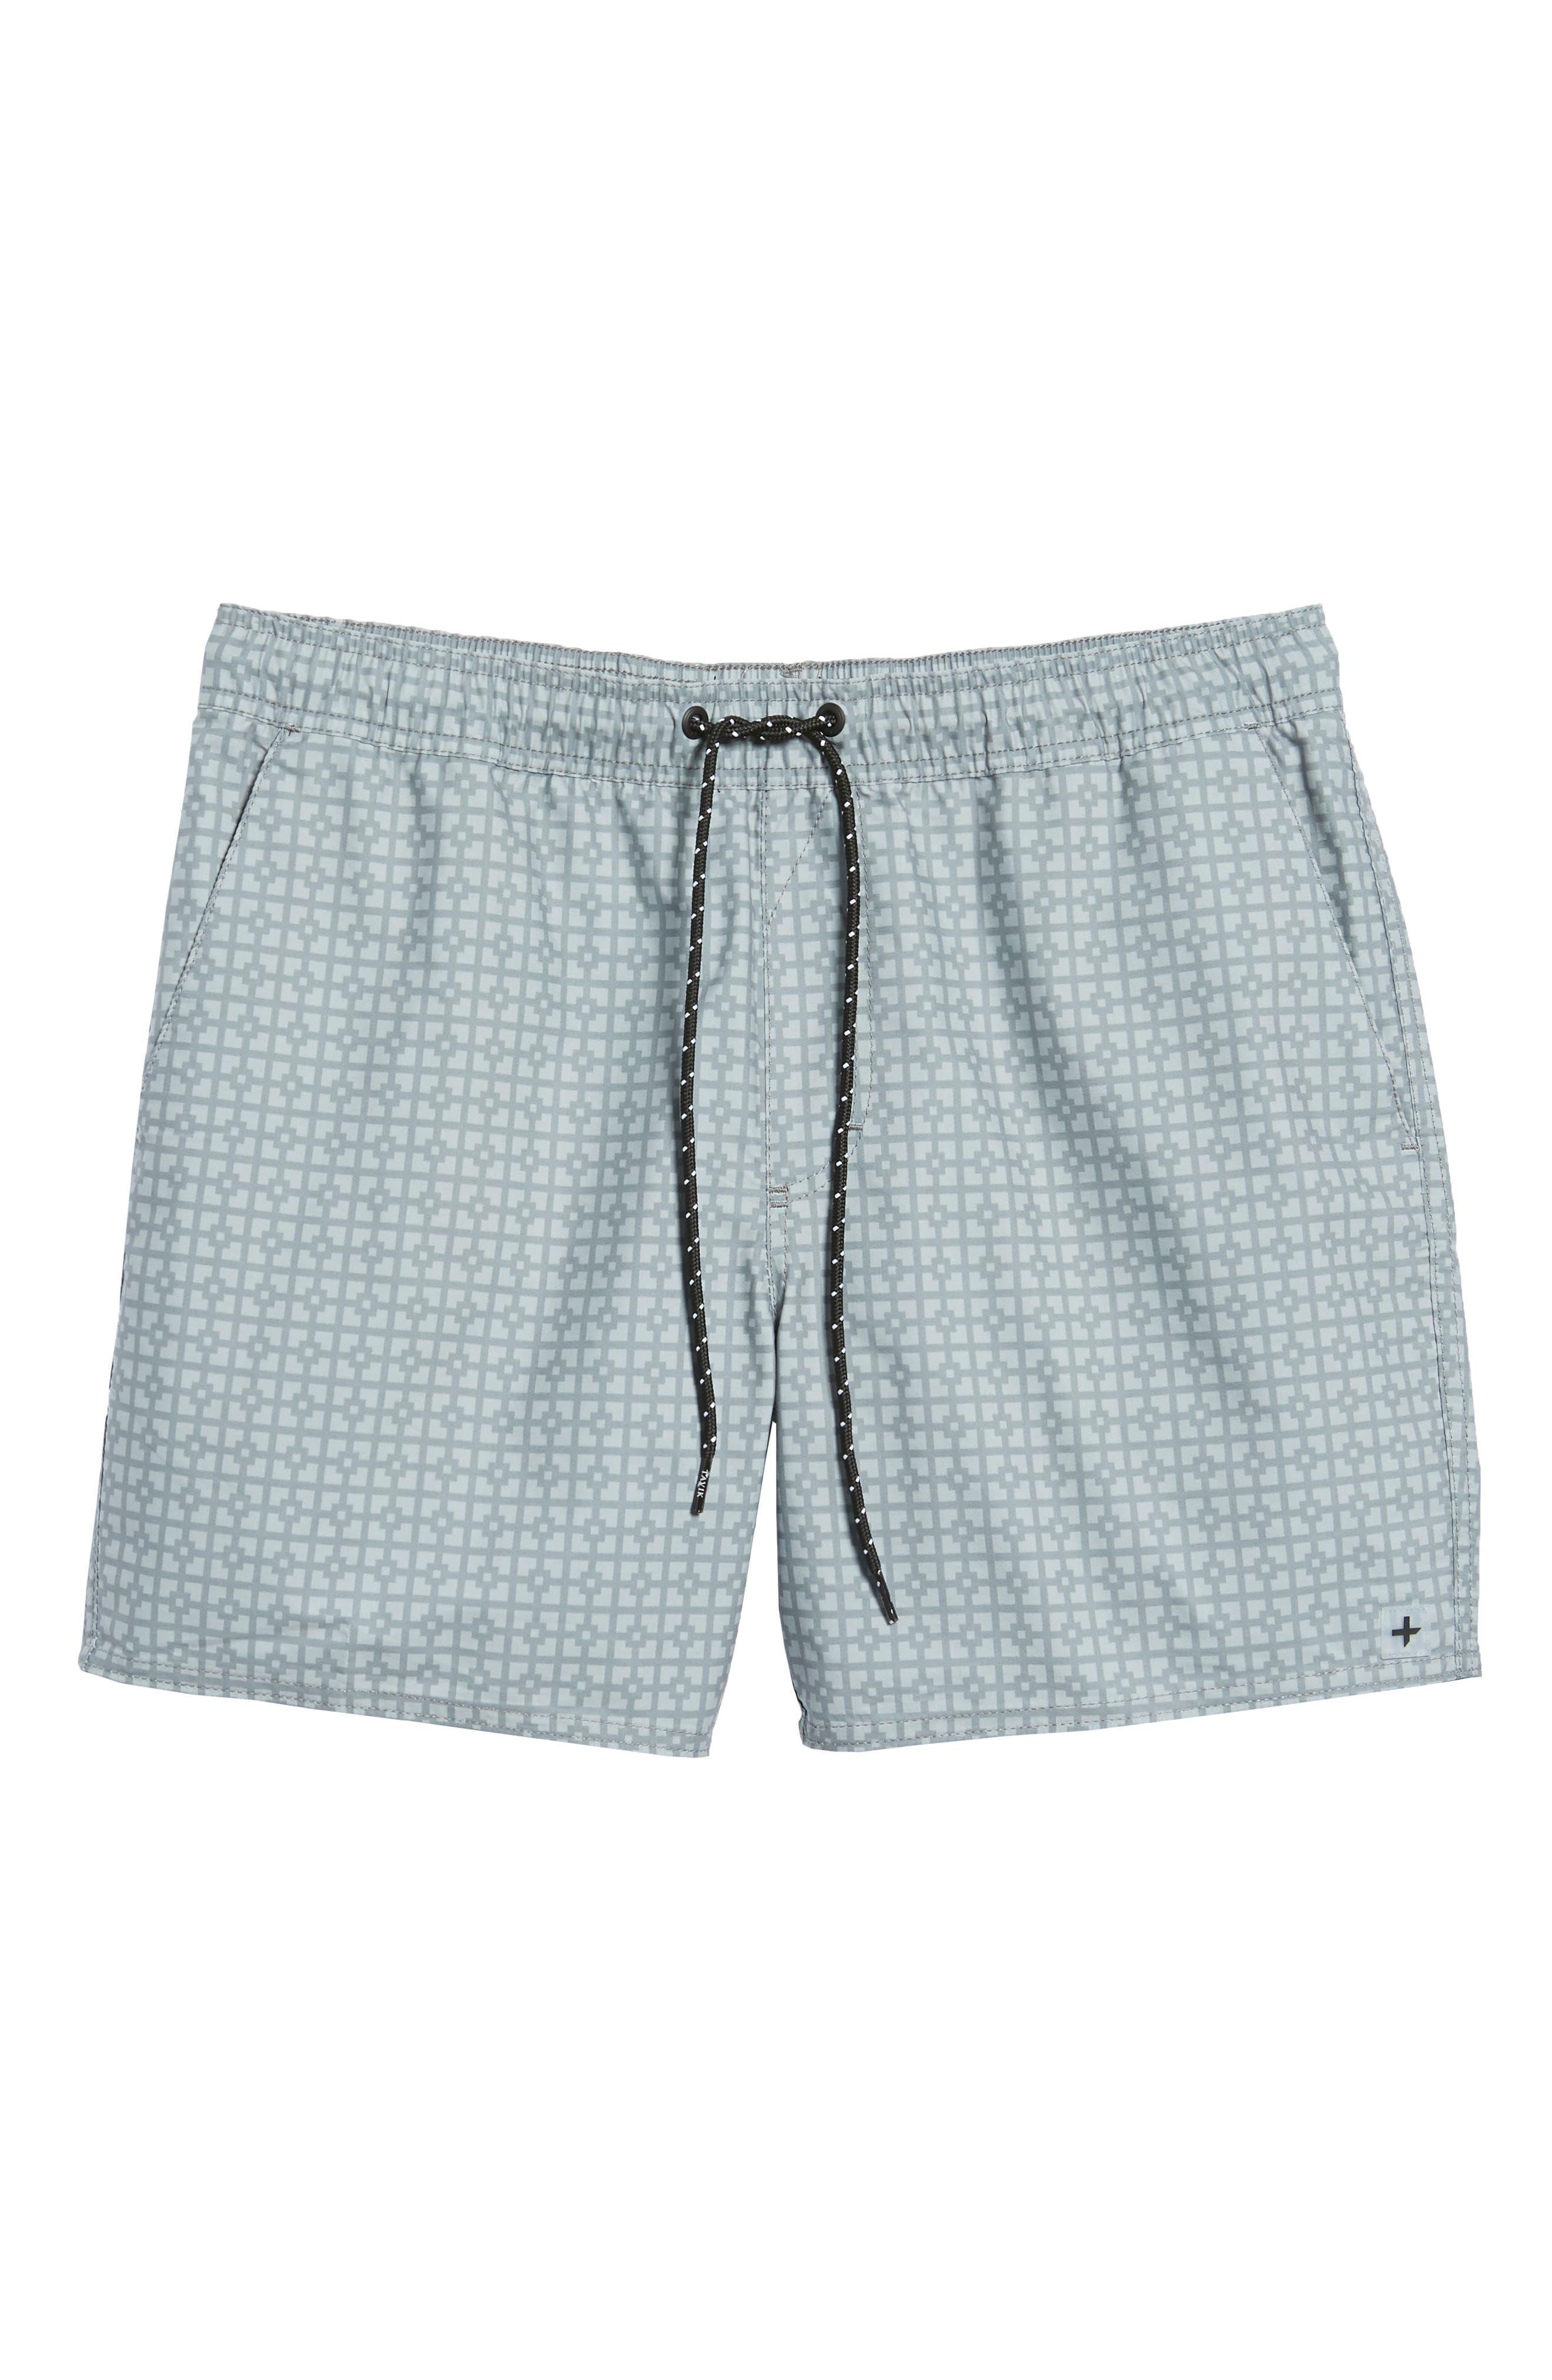 Belmont Pool Shorts,                             Alternate thumbnail 6, color,                             035